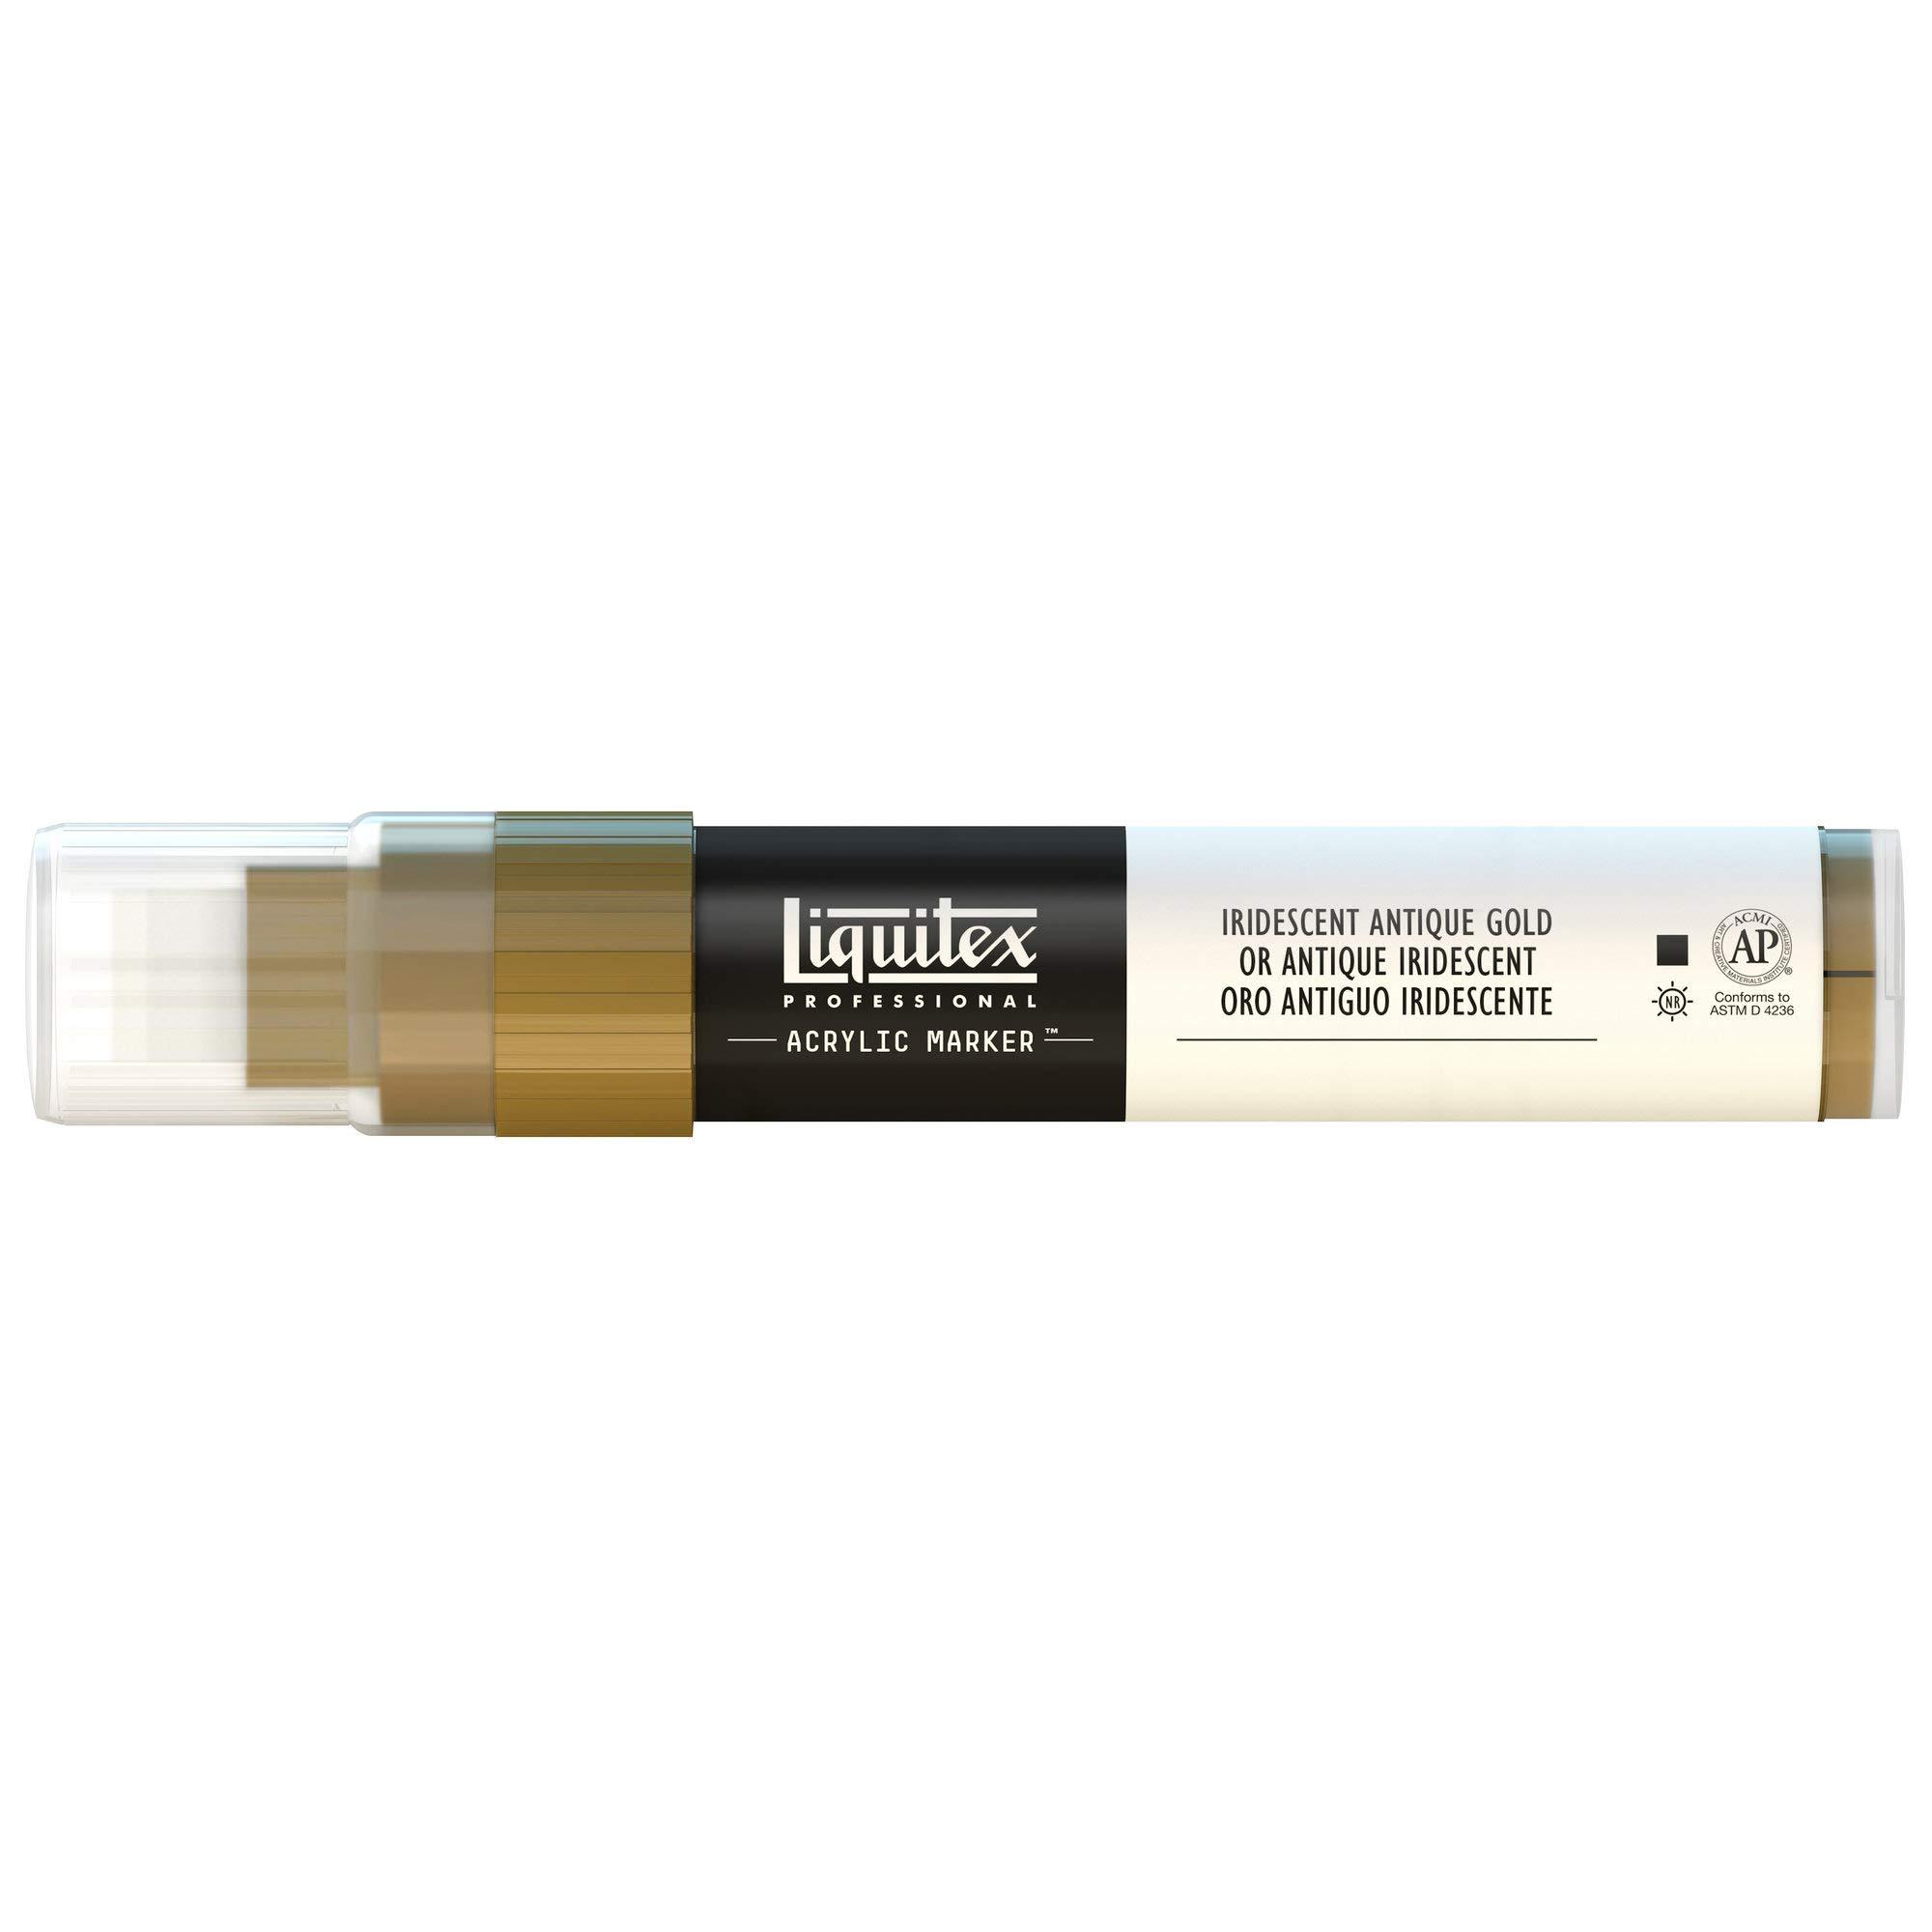 Liquitex Professional Wide Paint Marker, Iridescent Antique Gold